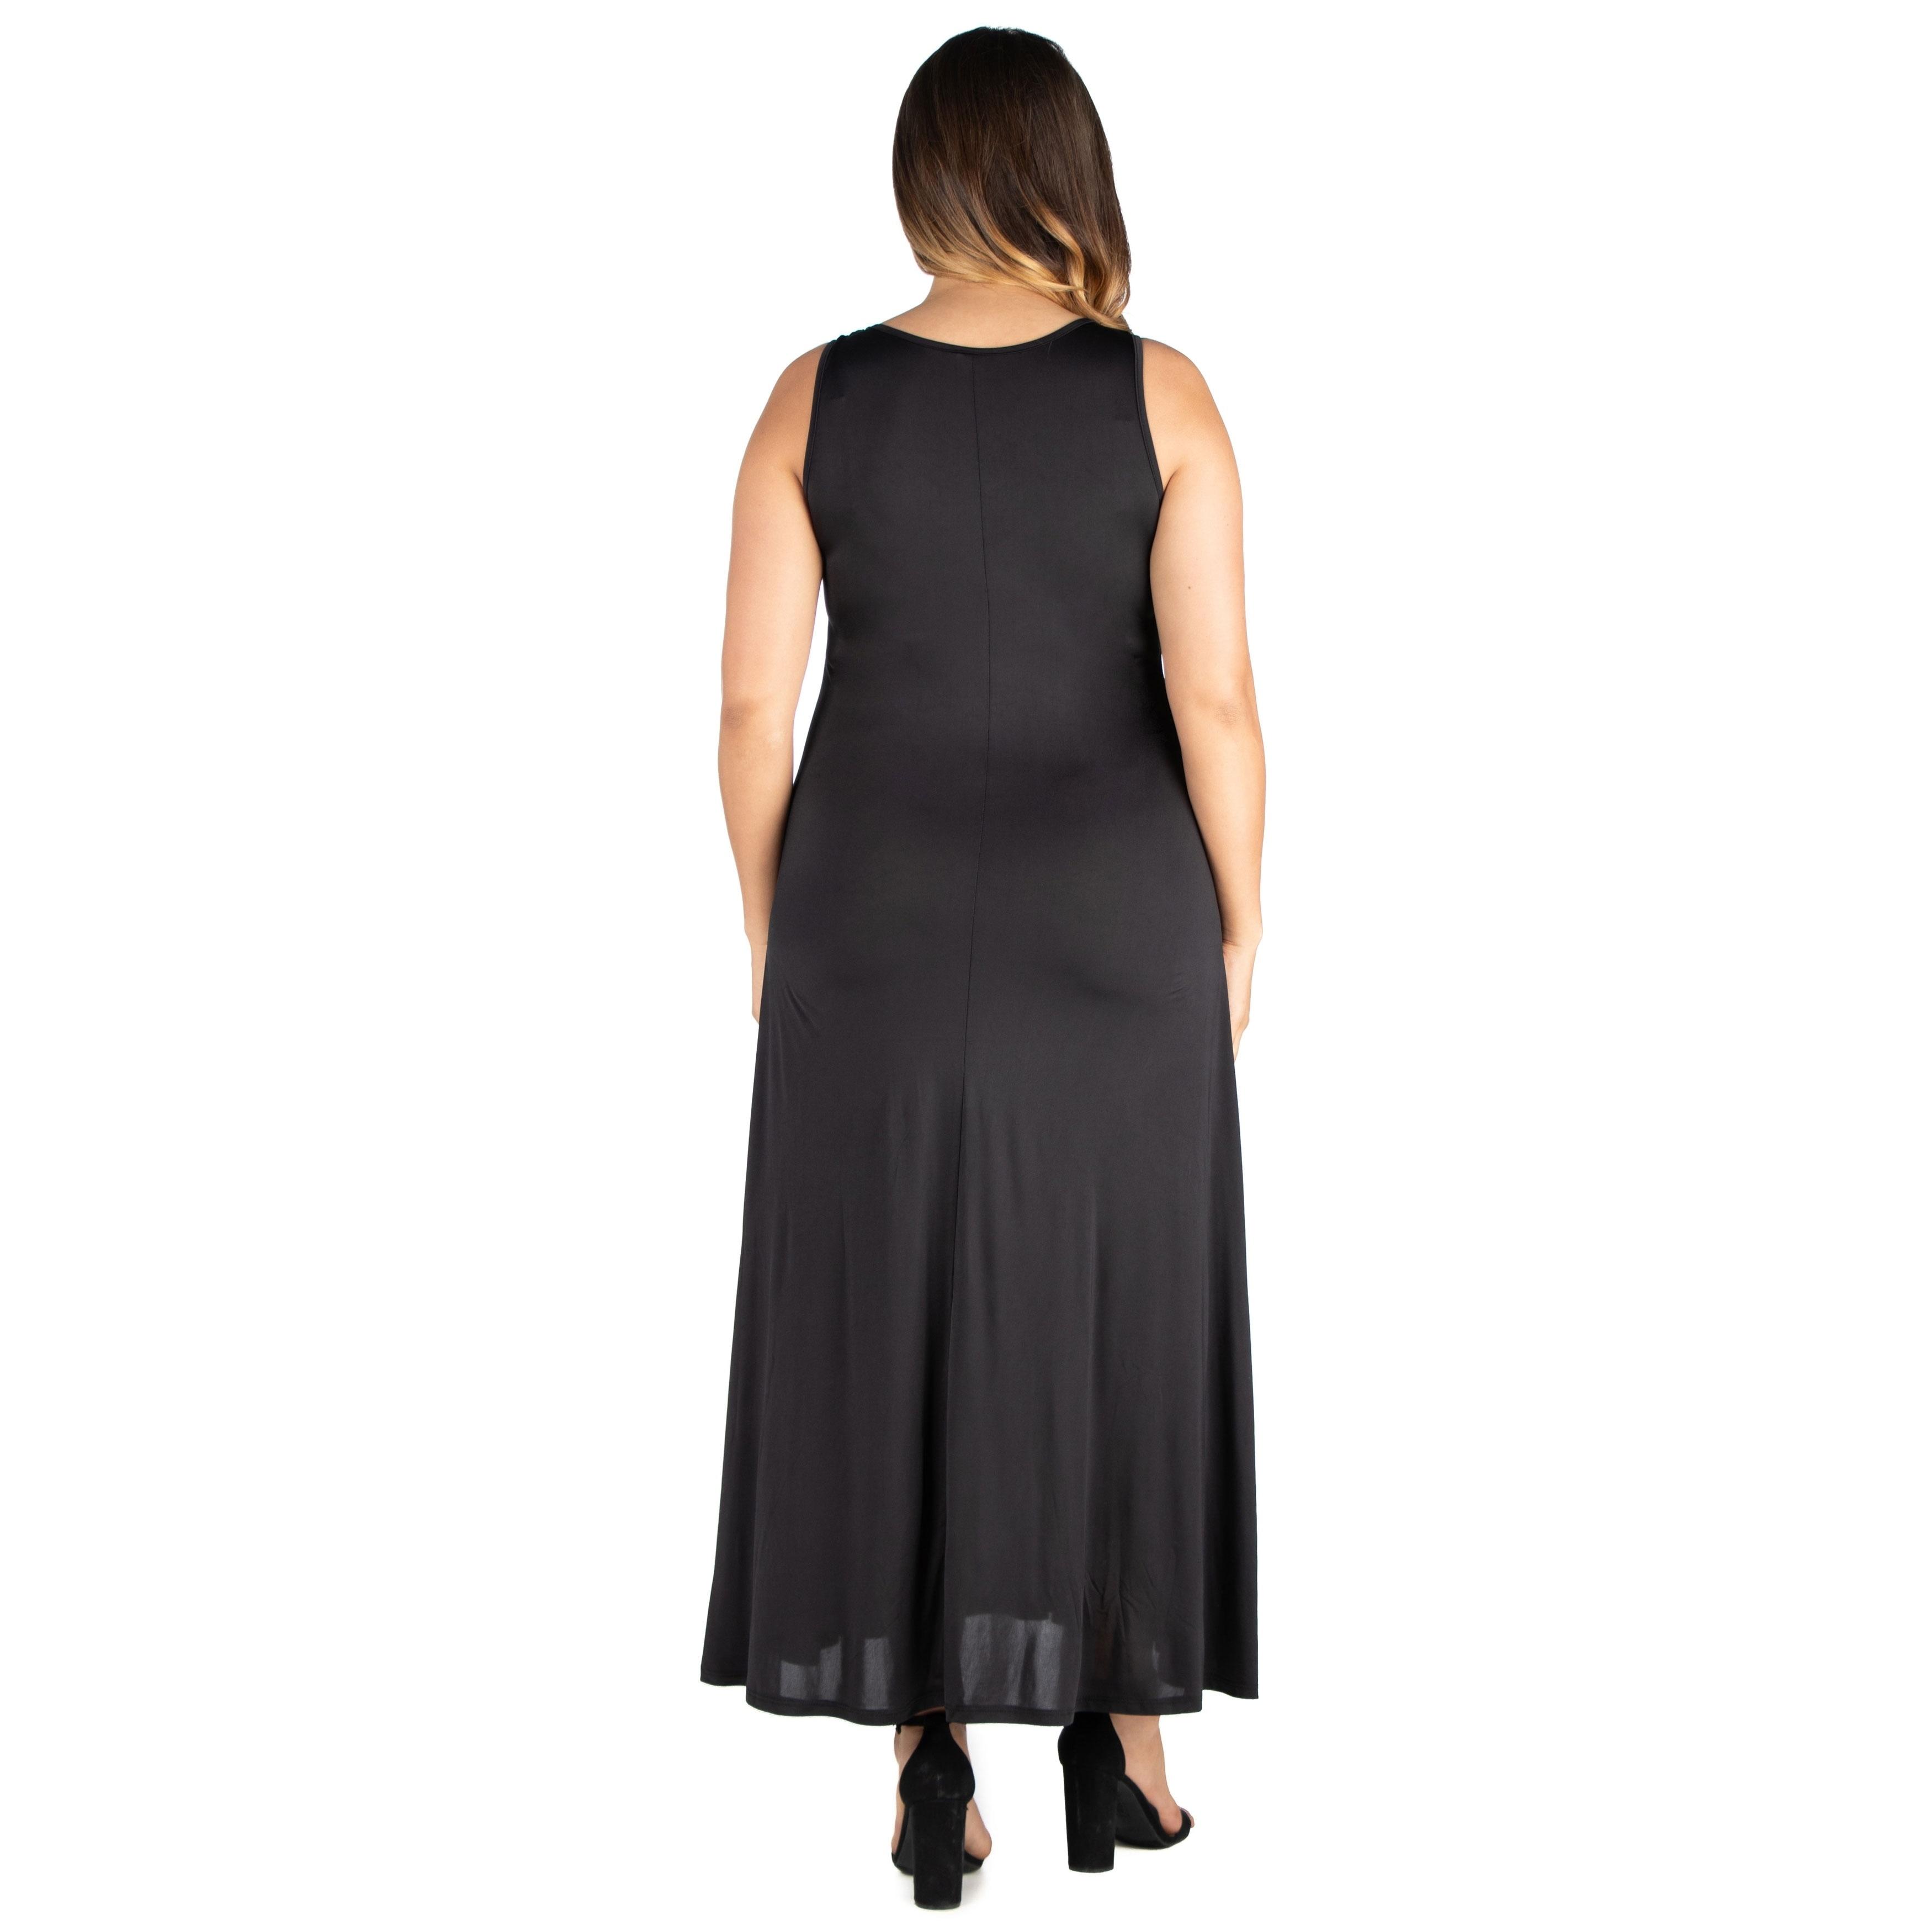 24seven Comfort Apparel Simple A Line Plus Size Tank Maxi Dress